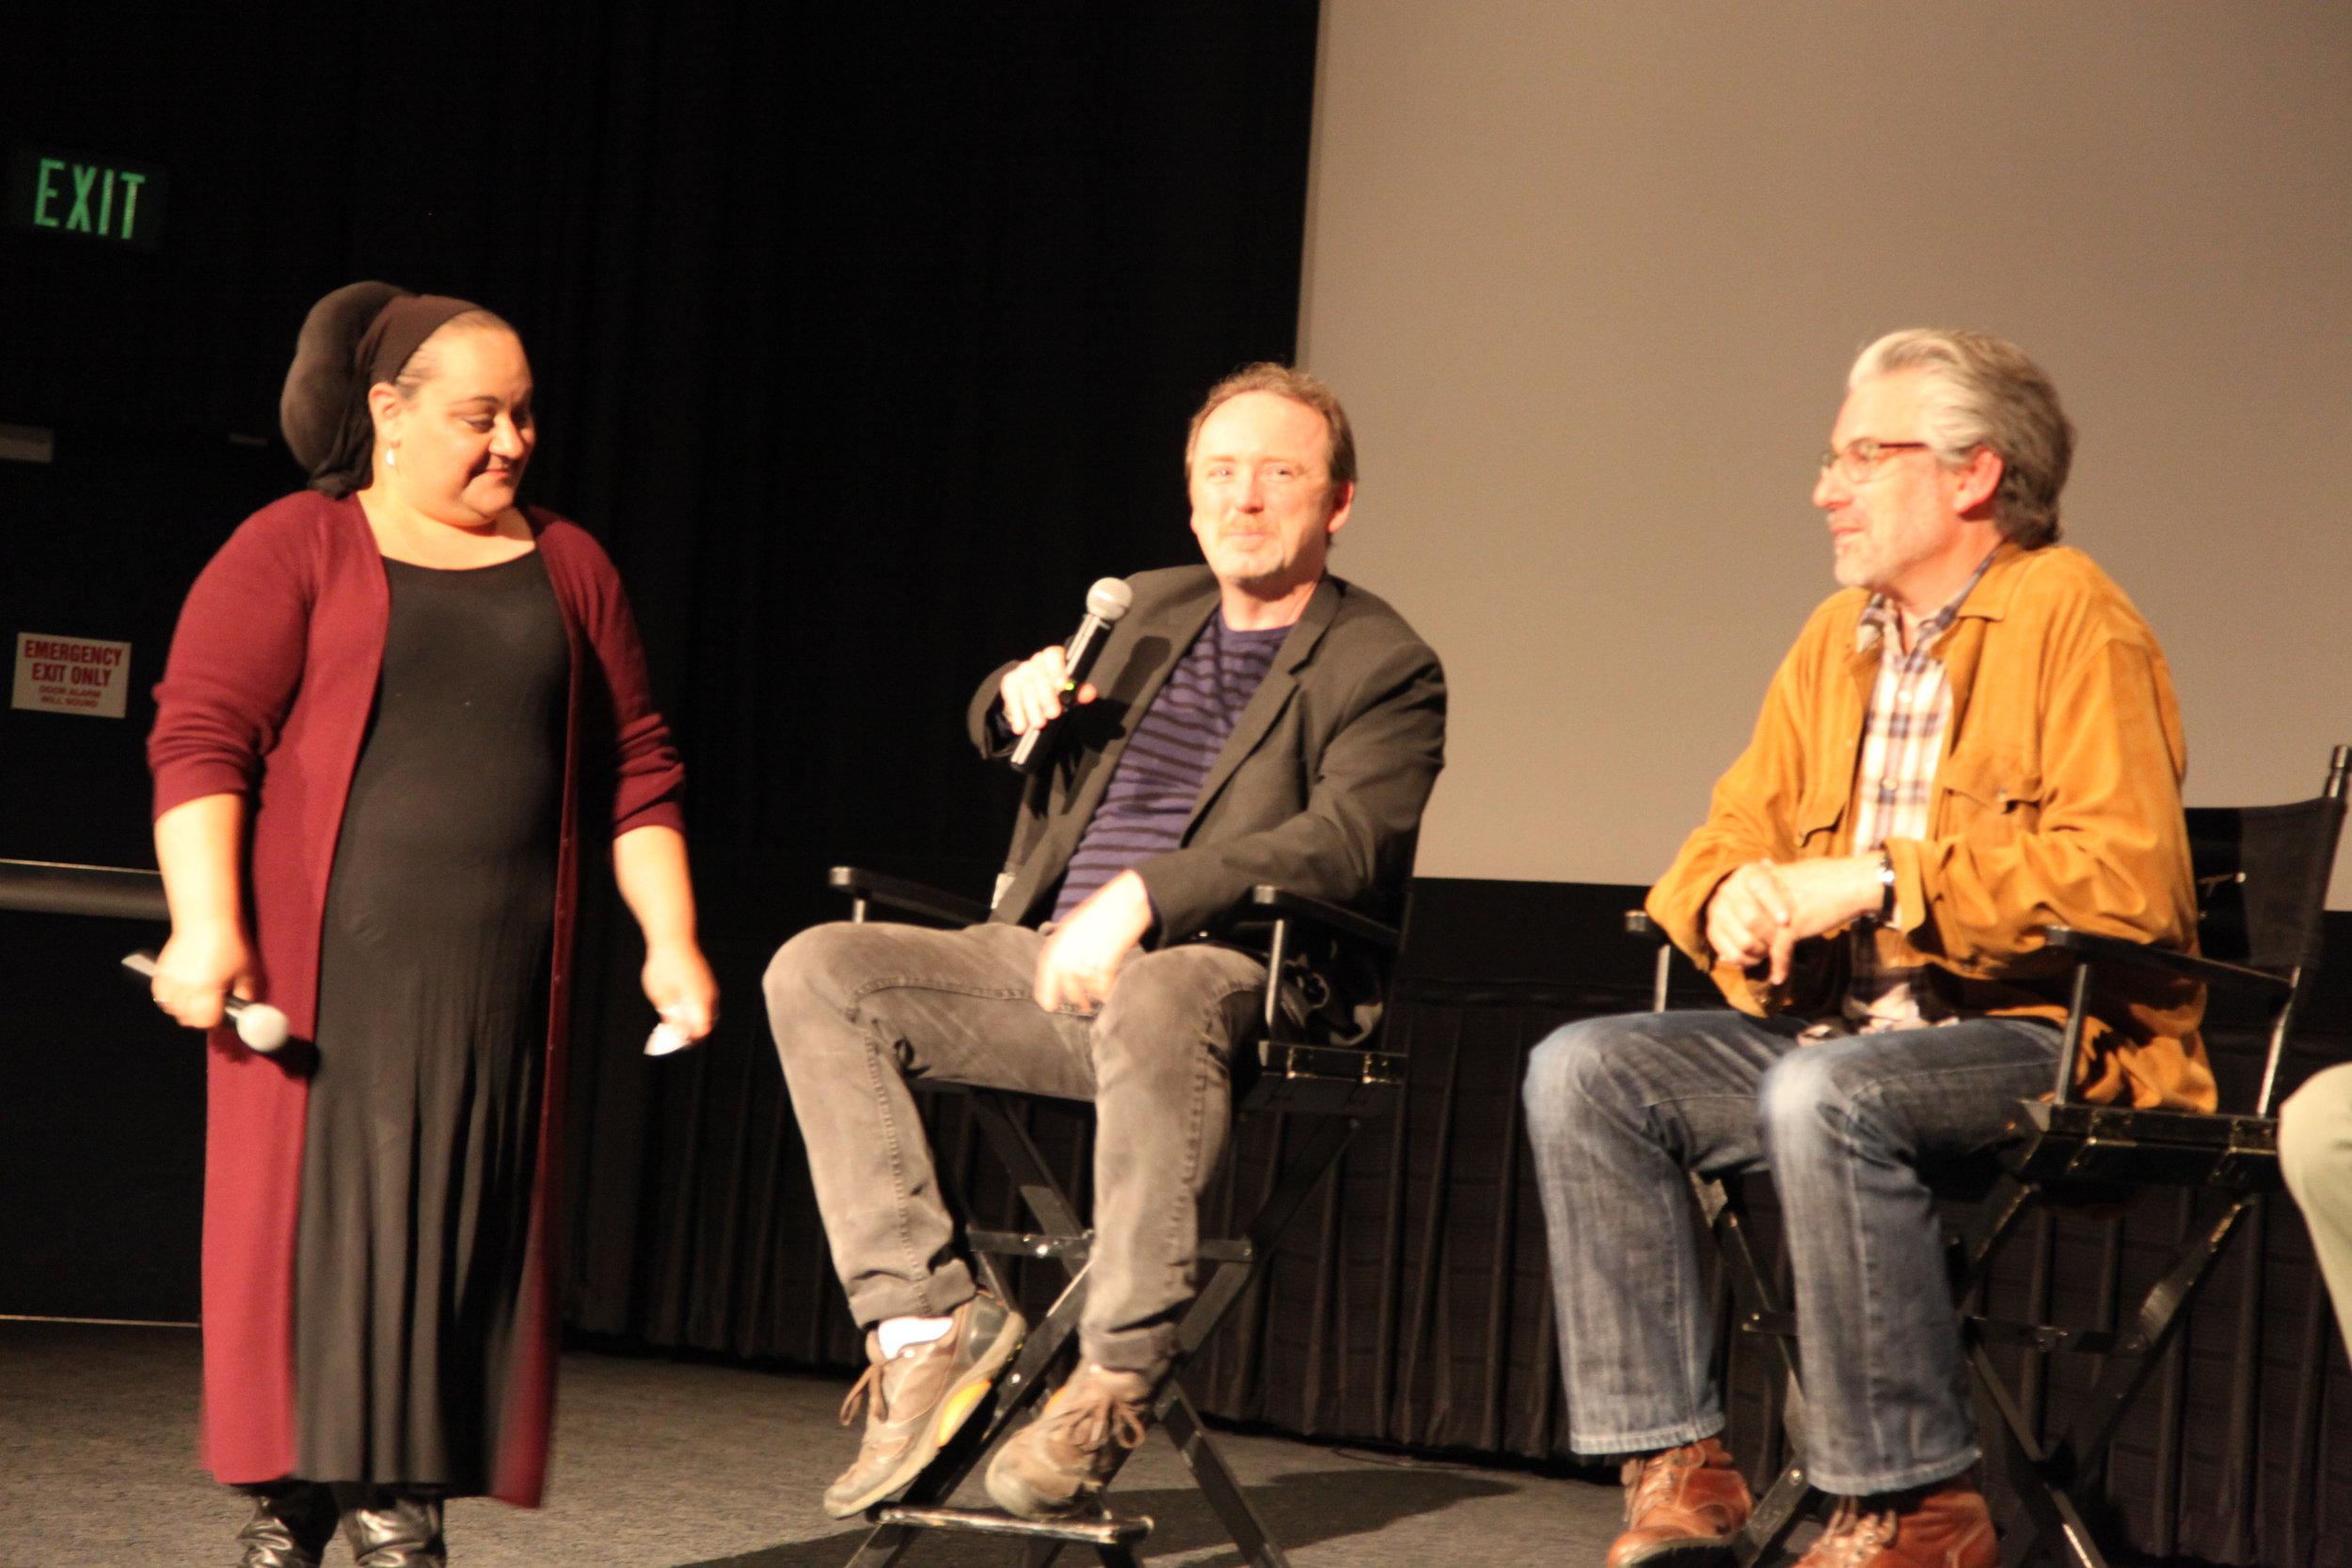 Curator, Marjan Safinia, Consulting Editor/Associate Producer, Doug Blush, Director, Paul Lazarus